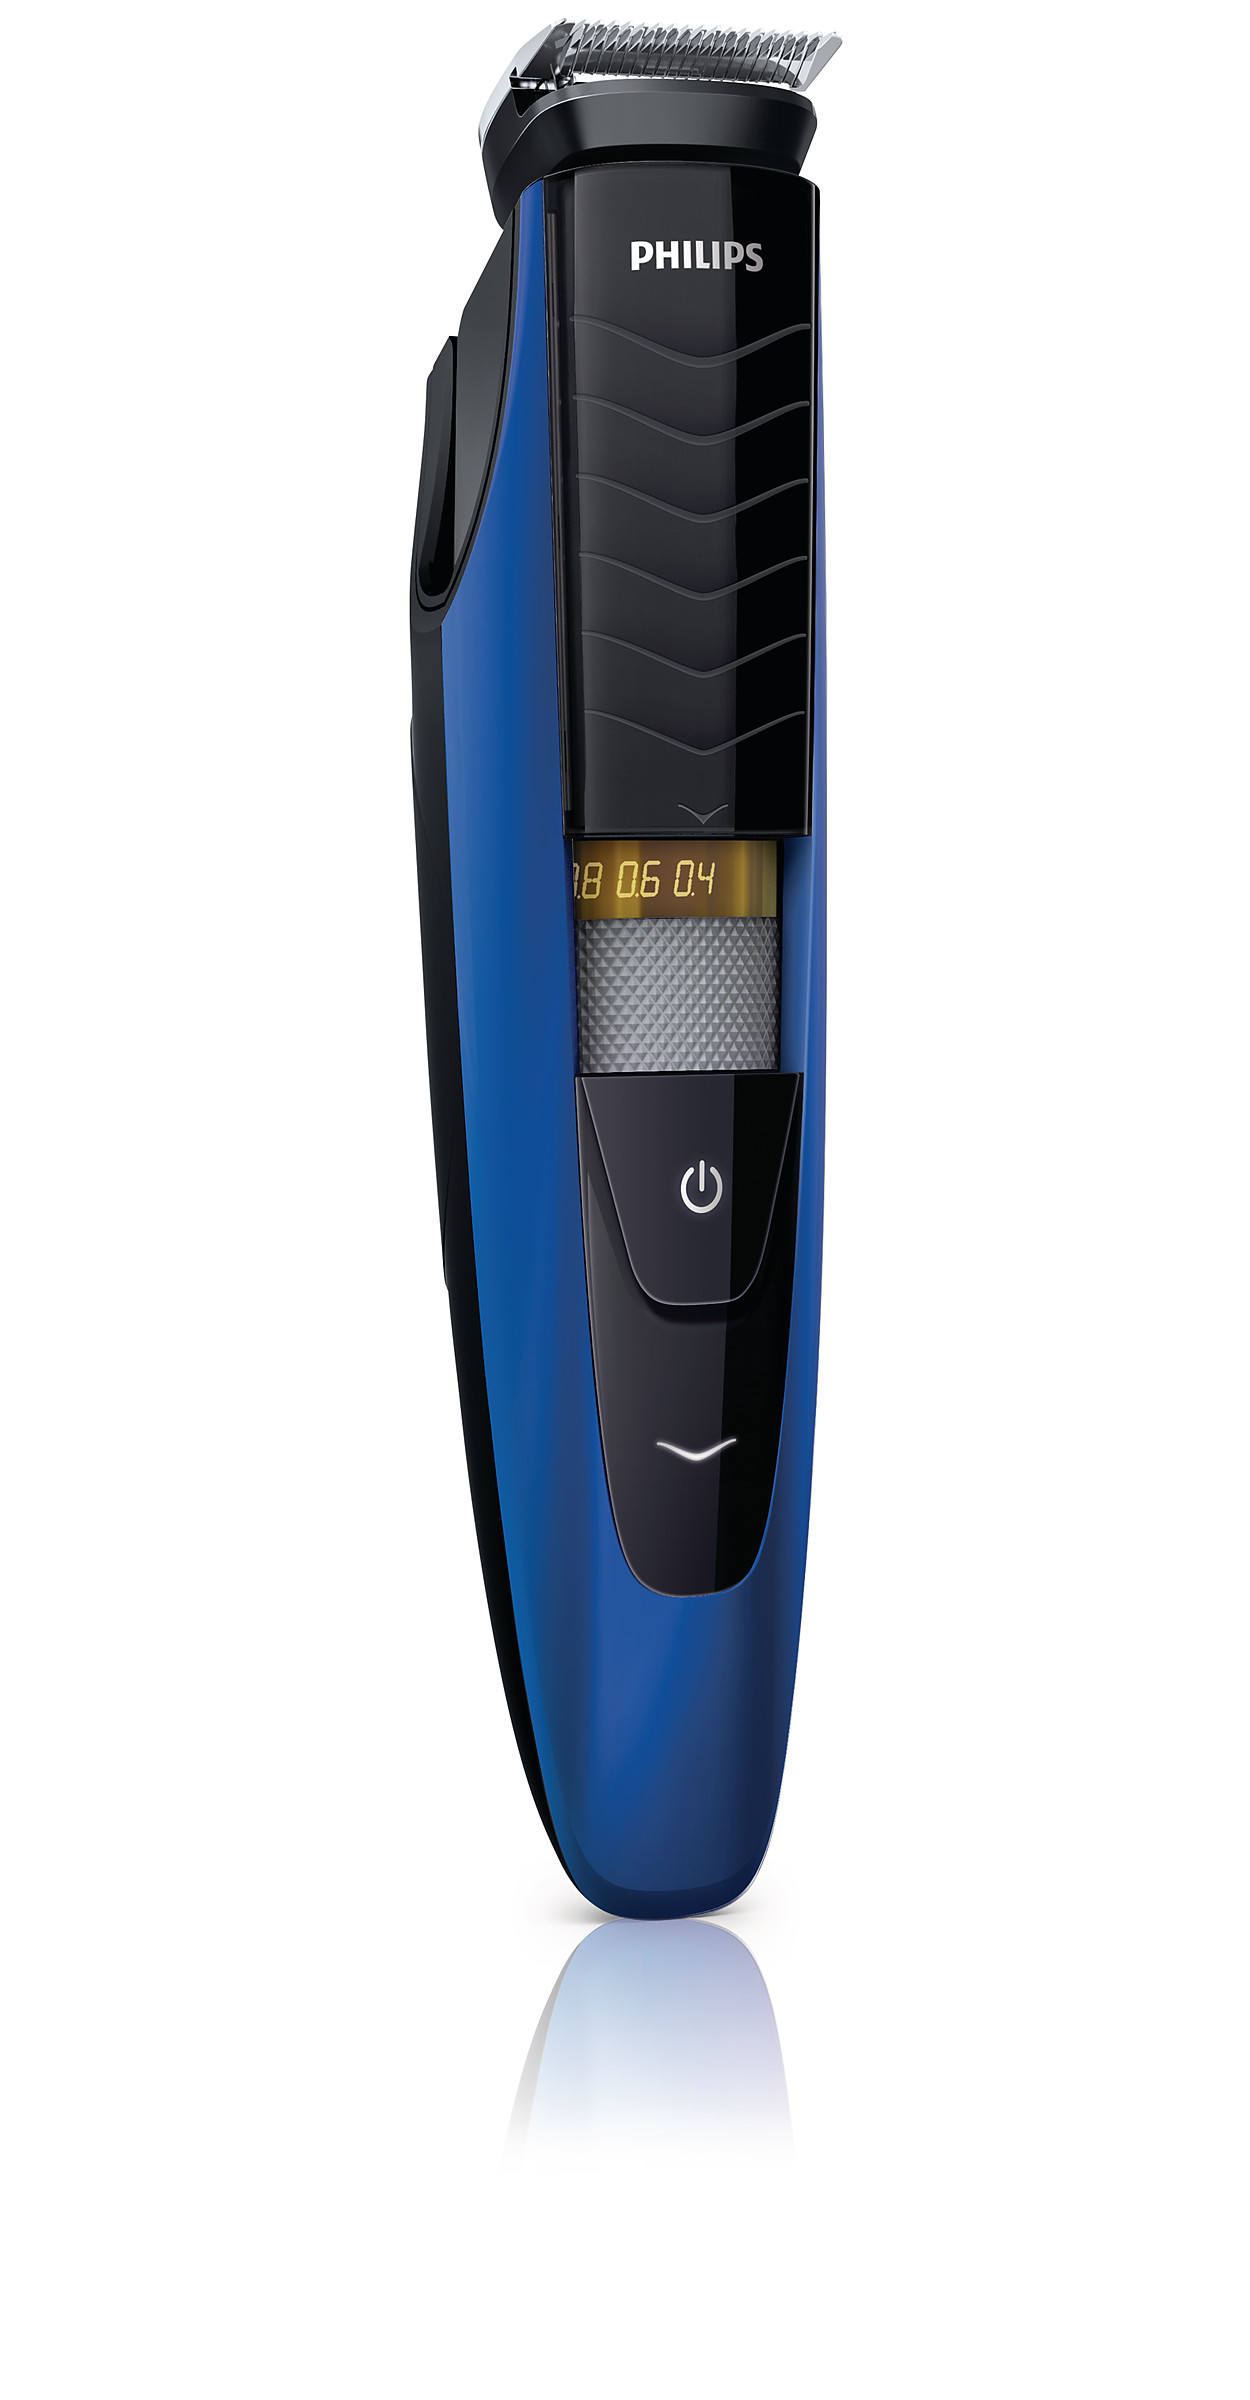 beardtrimmer series 5000 waterproof beard trimmer bt5260 33 philips. Black Bedroom Furniture Sets. Home Design Ideas